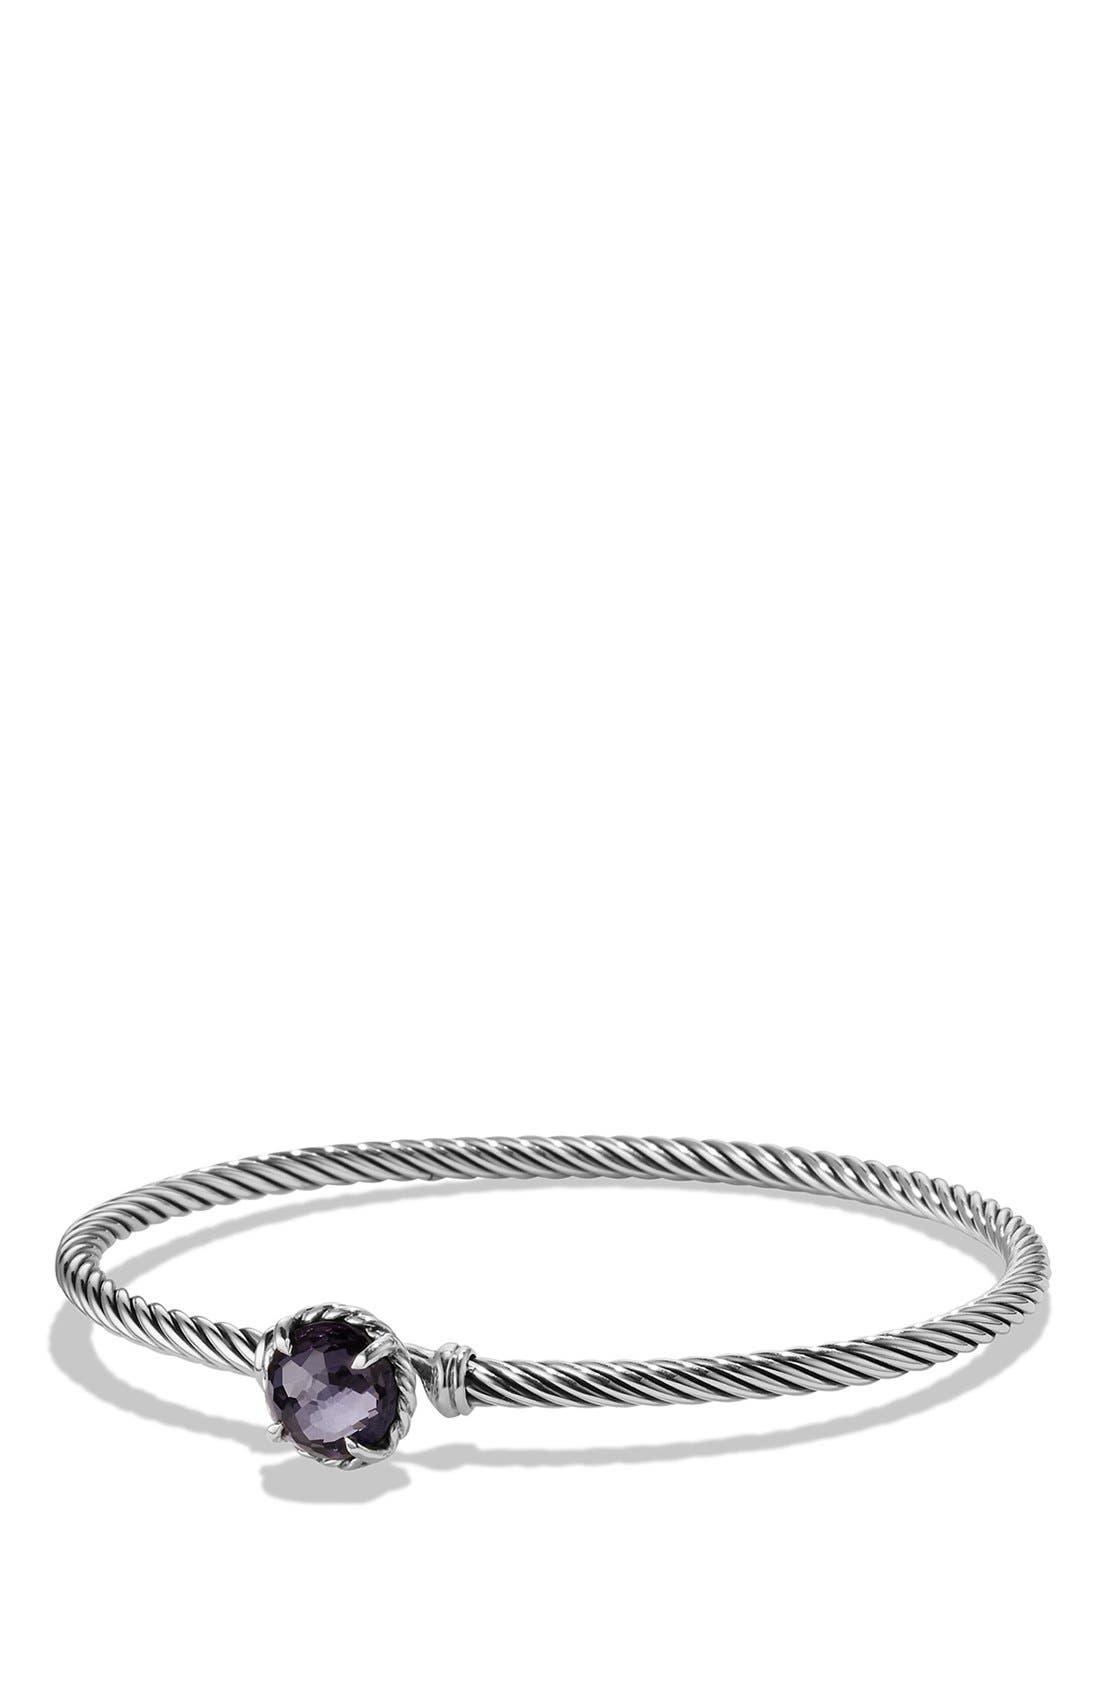 Main Image - David Yurman 'Color Classics' Bangle Bracelet